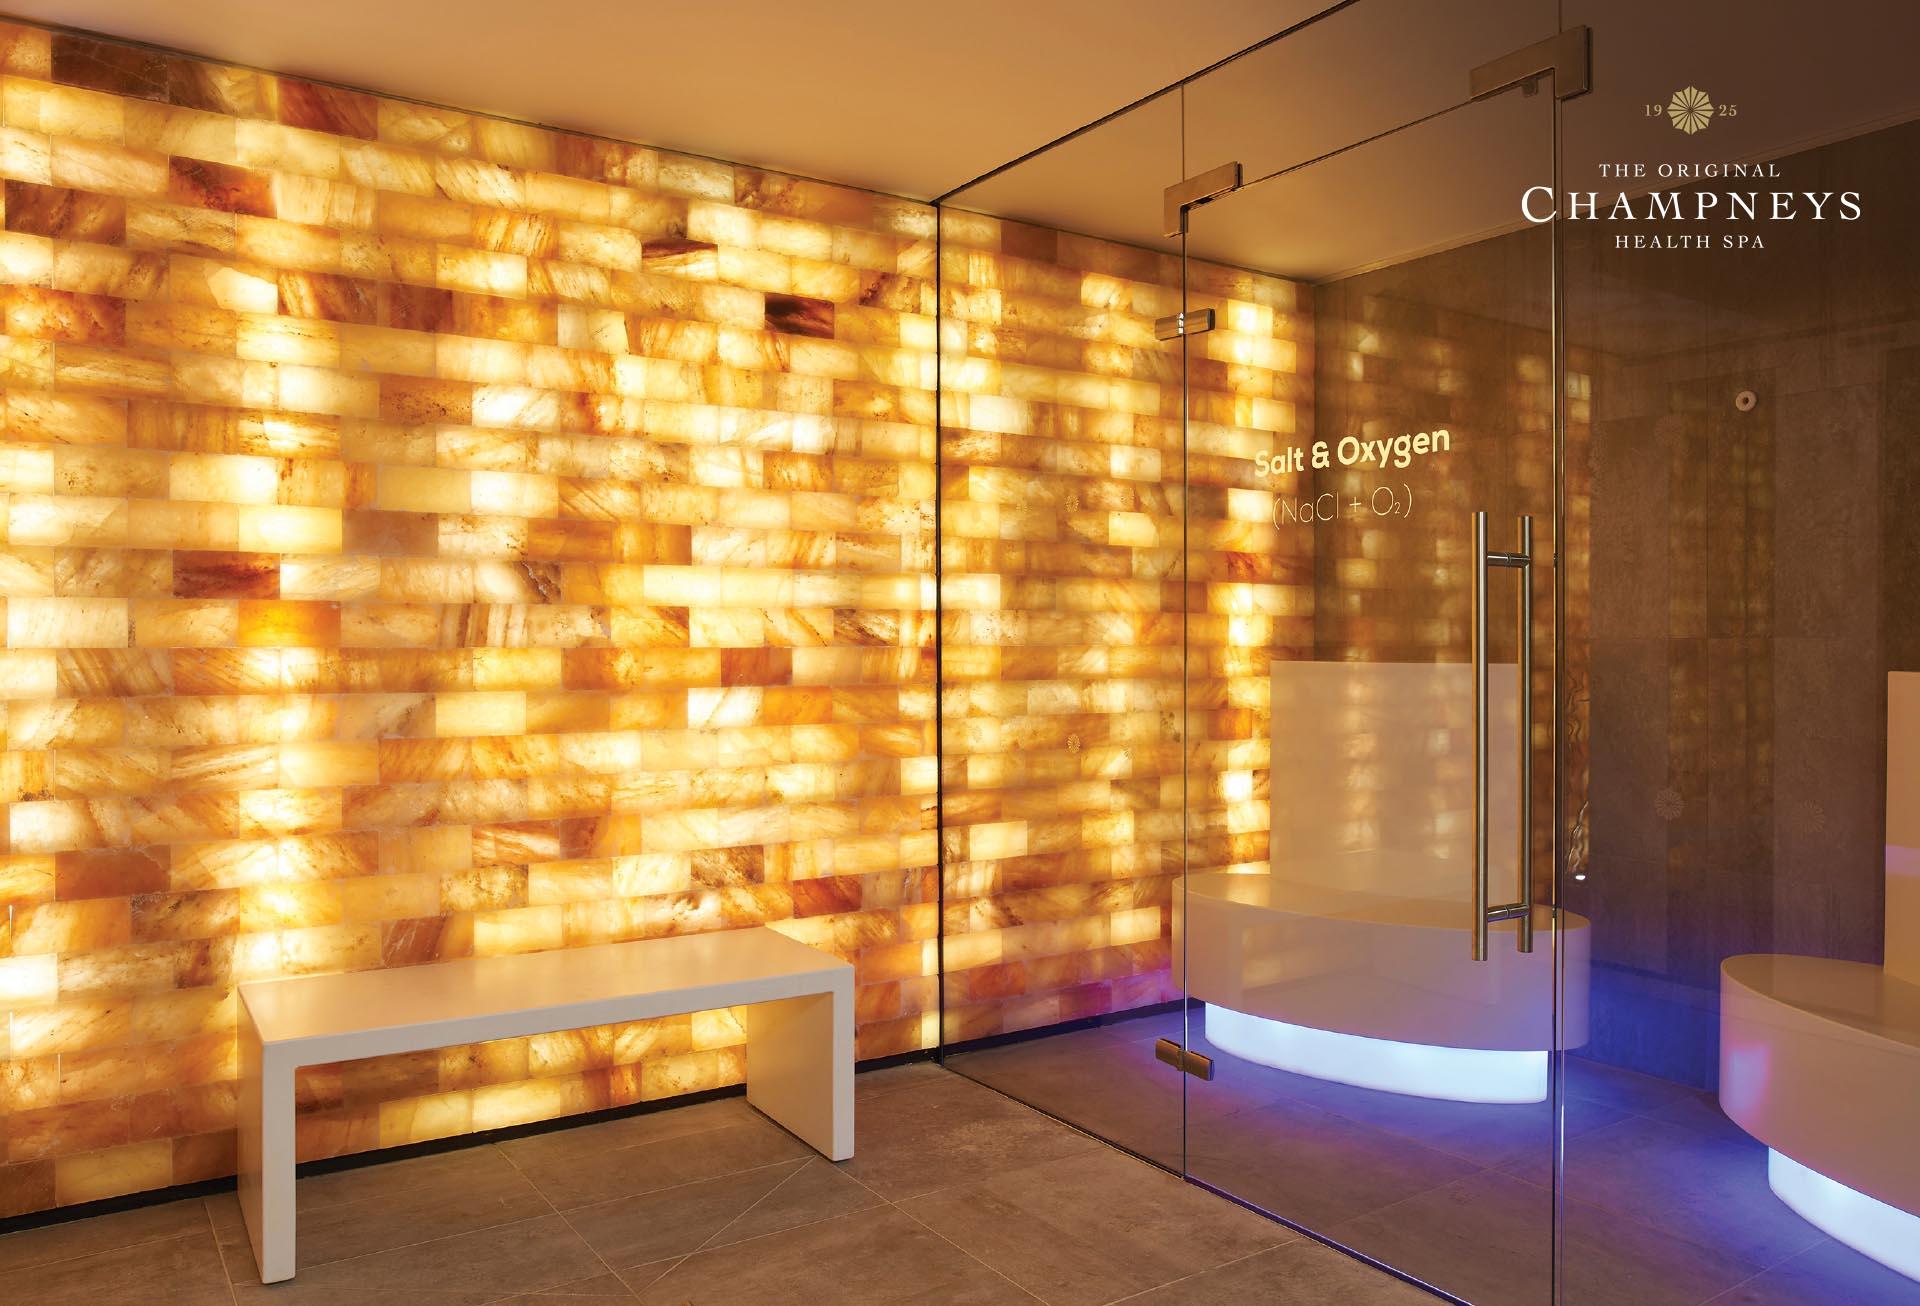 Champneys-Tring-Spa-Designers-Salt-Wall